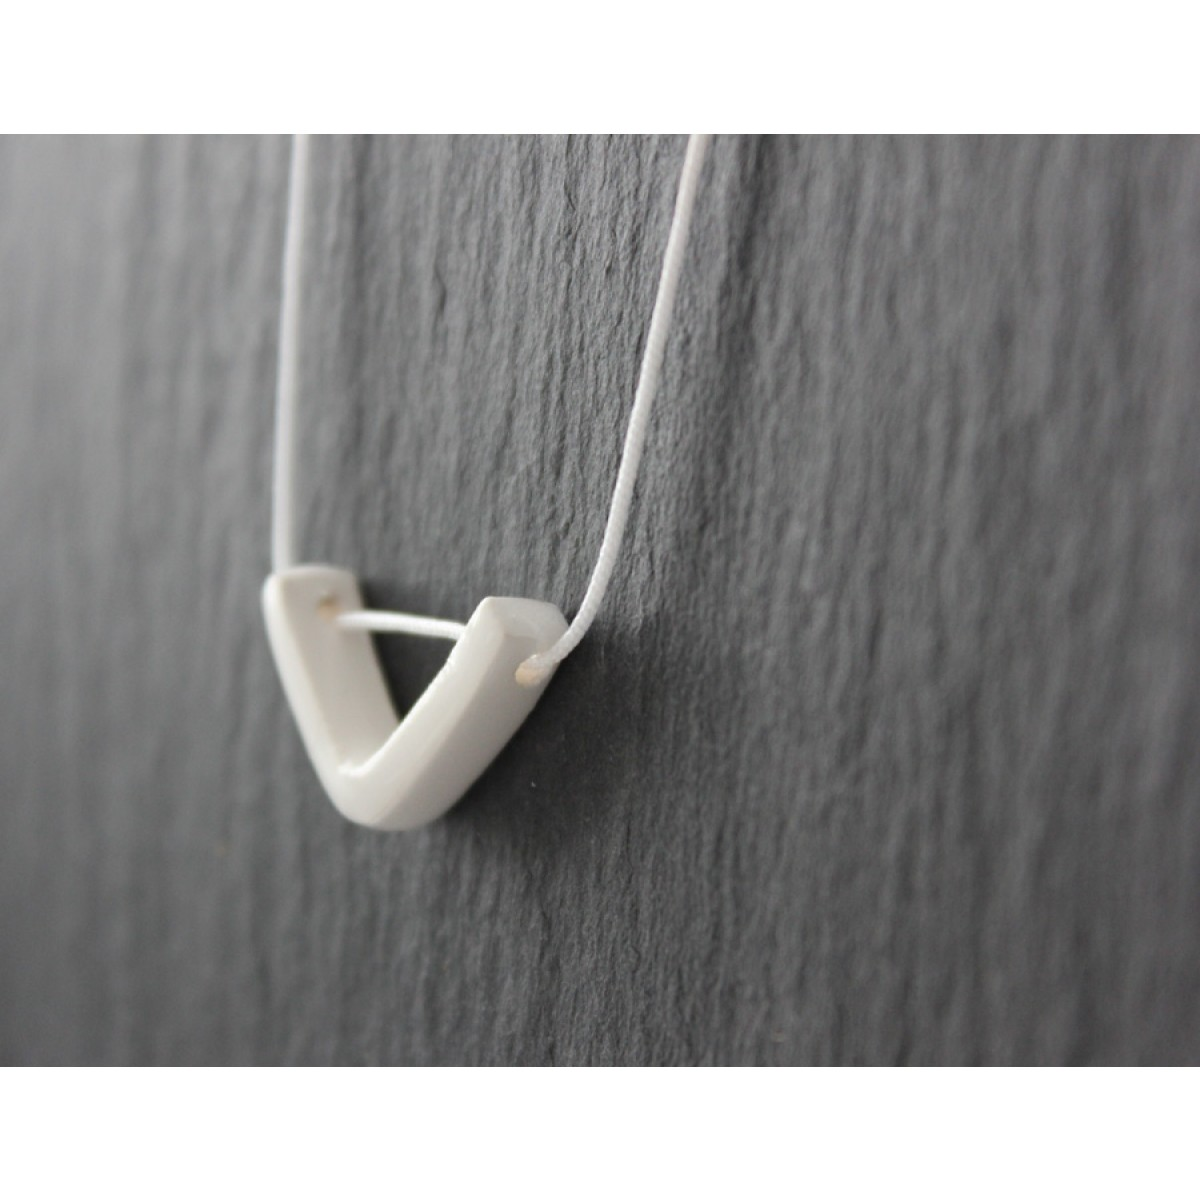 Skelini - Weiße Porzellankette Dreieck